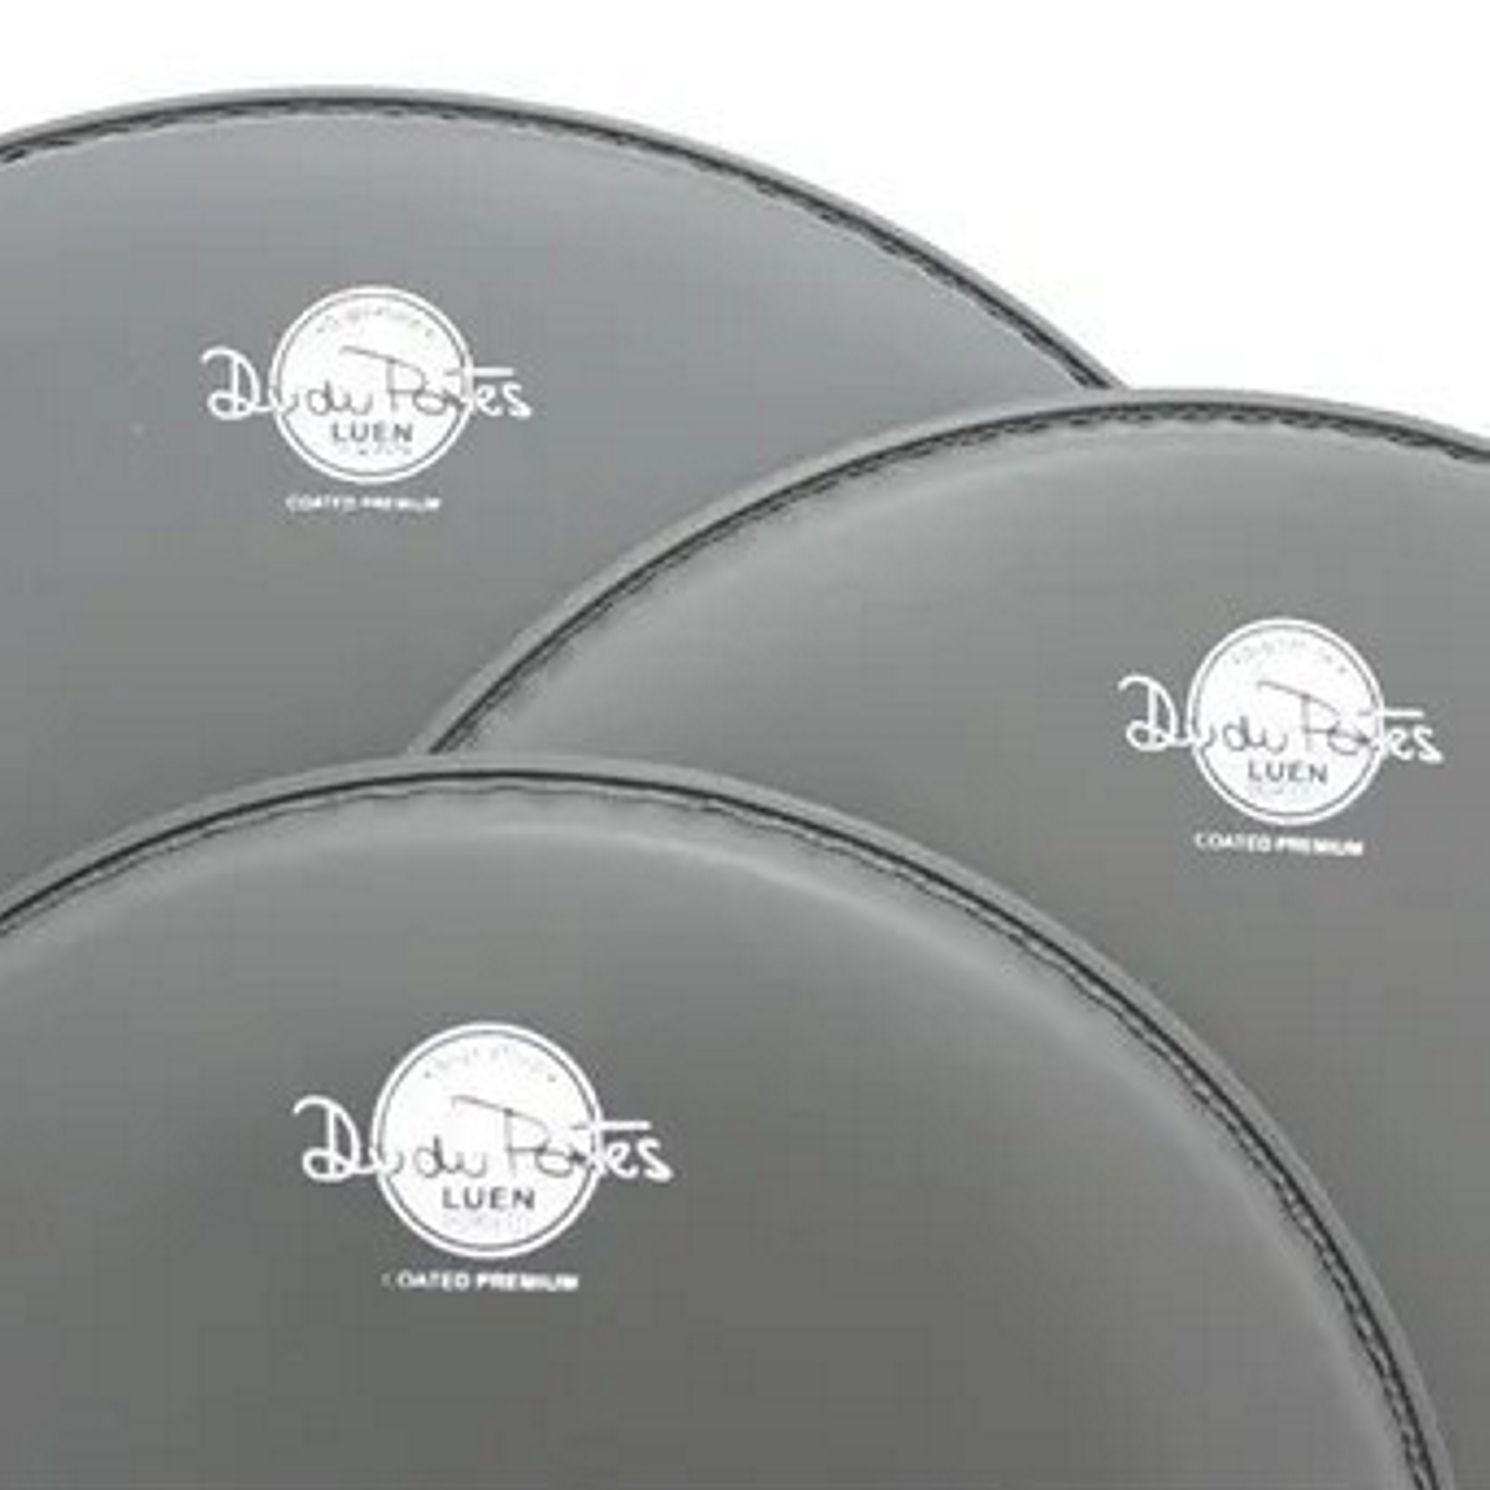 Jogo de Pele de Bateria - 12 - 13 - 16 - Coated Premium - Dudu Portes - Porosa - Luen